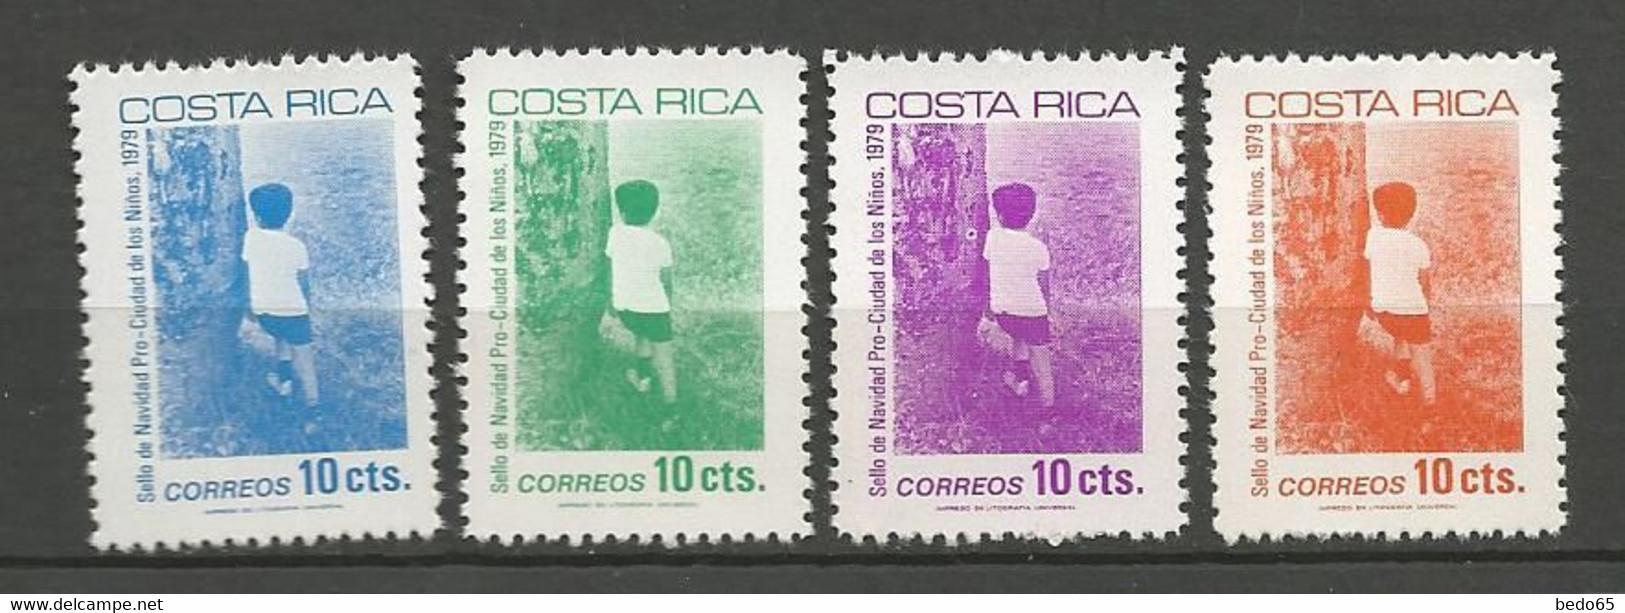 COSTA RICA  Yvert N° 340 à 343 NEUF** SANS CHARNIERE / MNH - Costa Rica